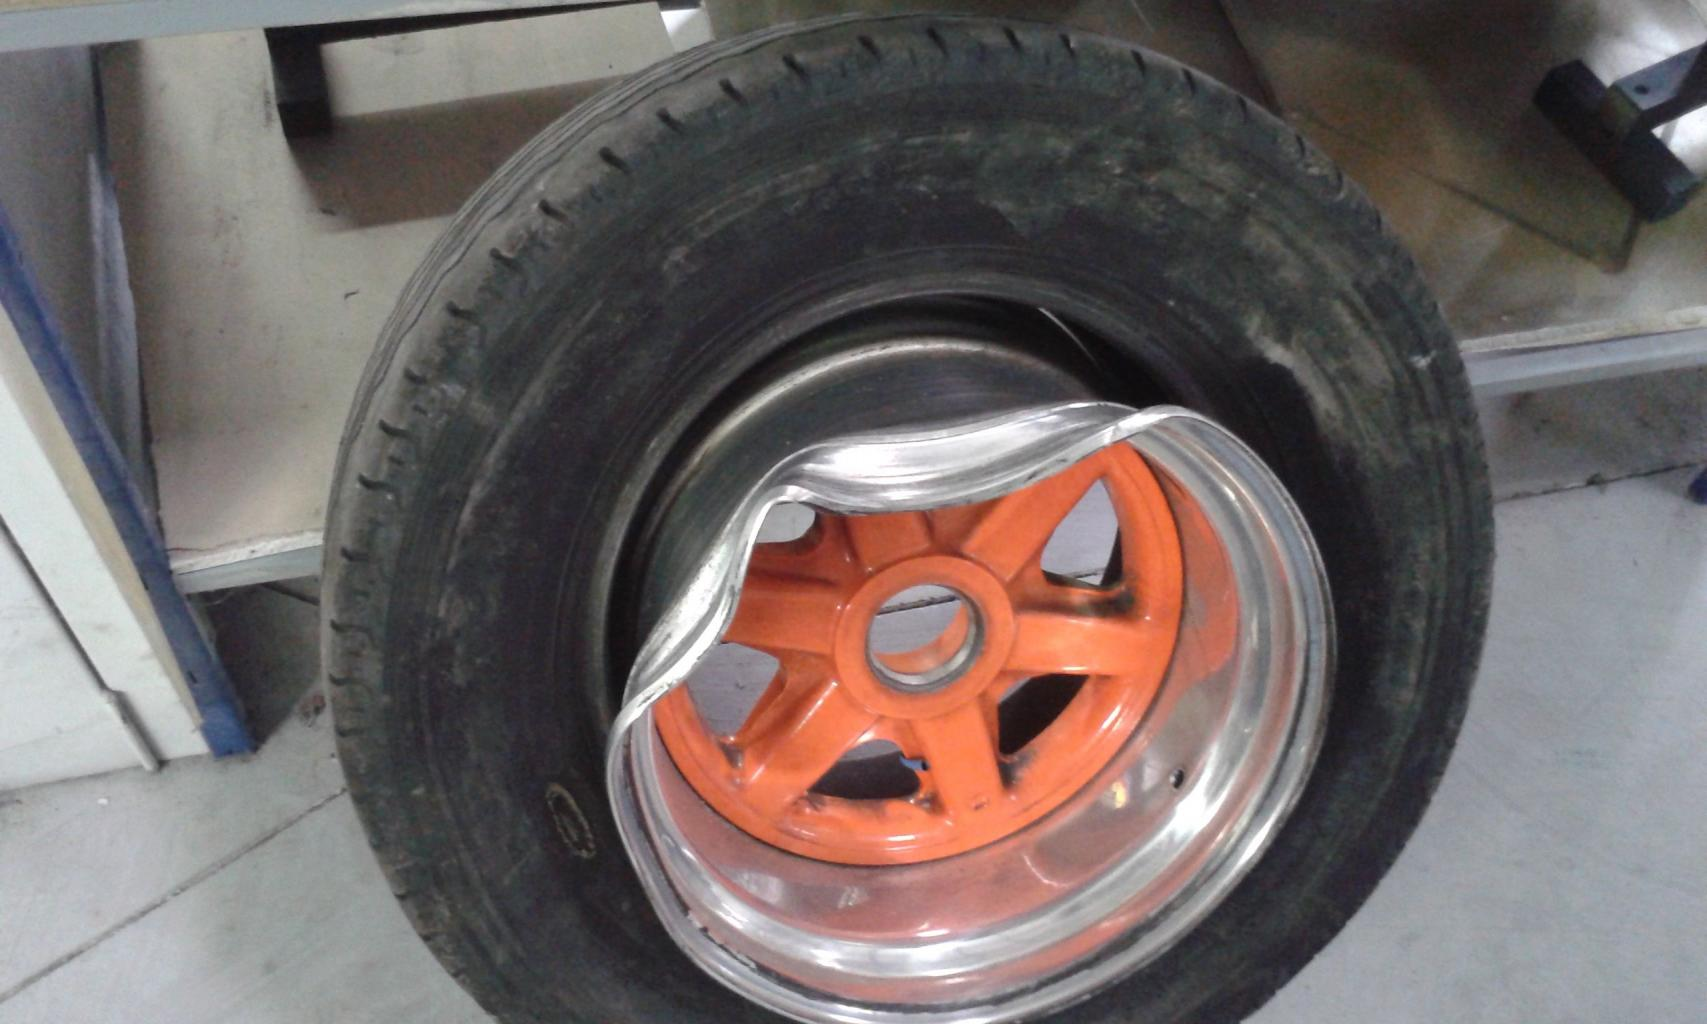 GTD knock on wheels?-roue-abime-e-jpg